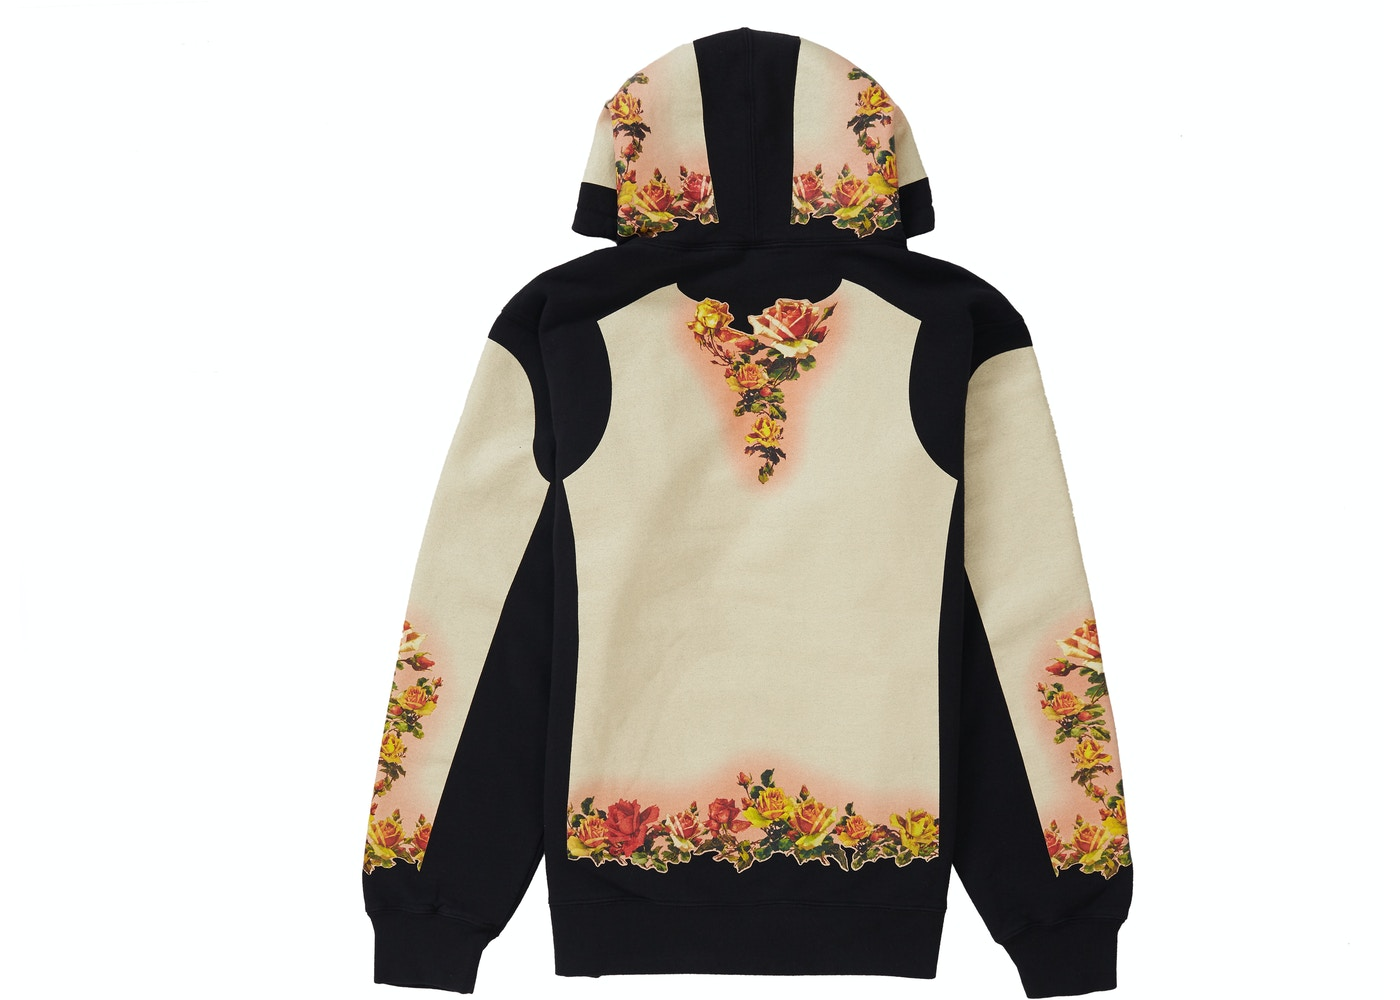 c5c85593d Supreme Jean Paul Gaultier Floral Print Hooded Sweatshirt Black - SS19